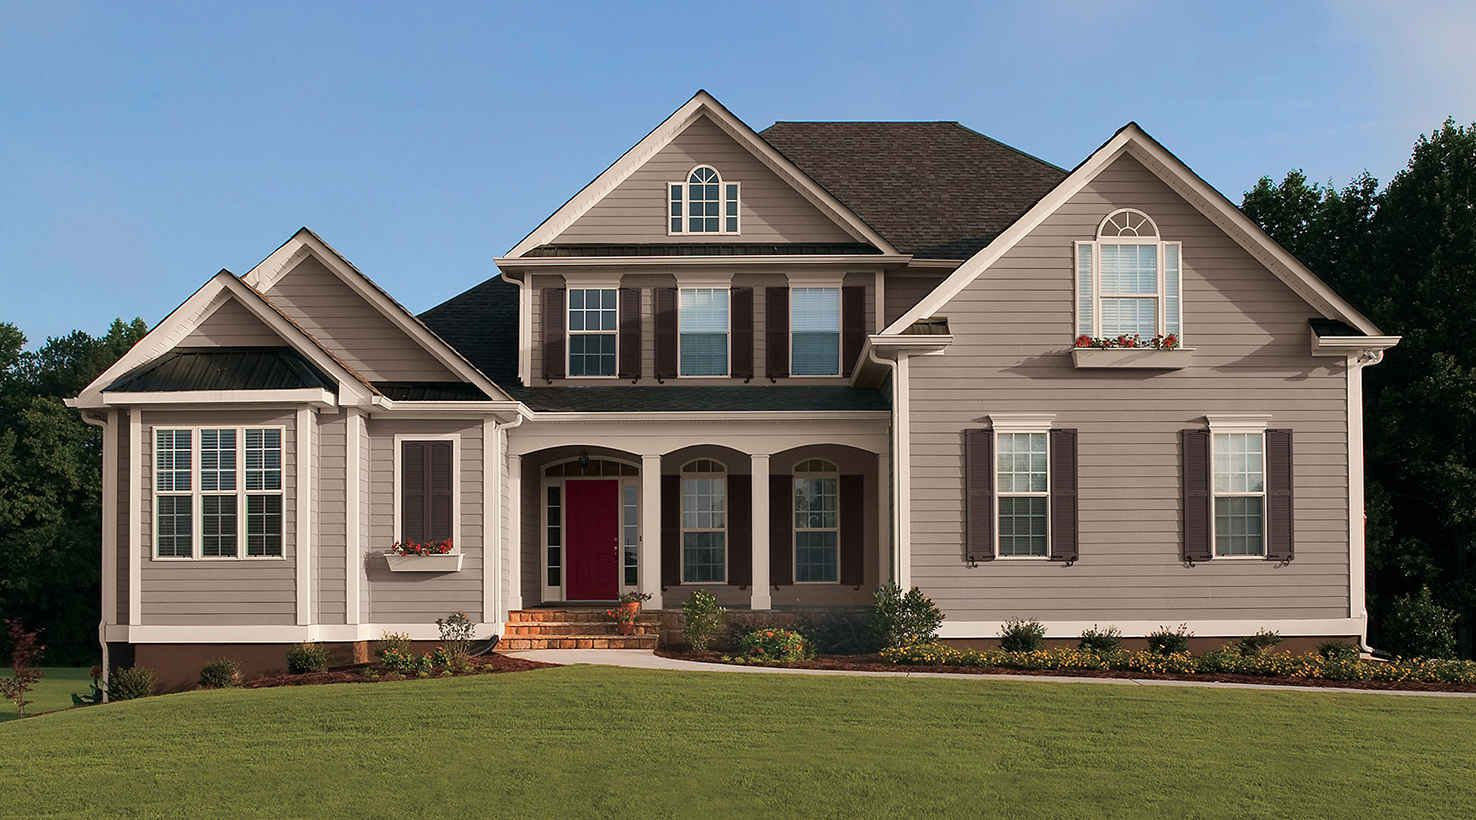 Exterior House Color Inspiration